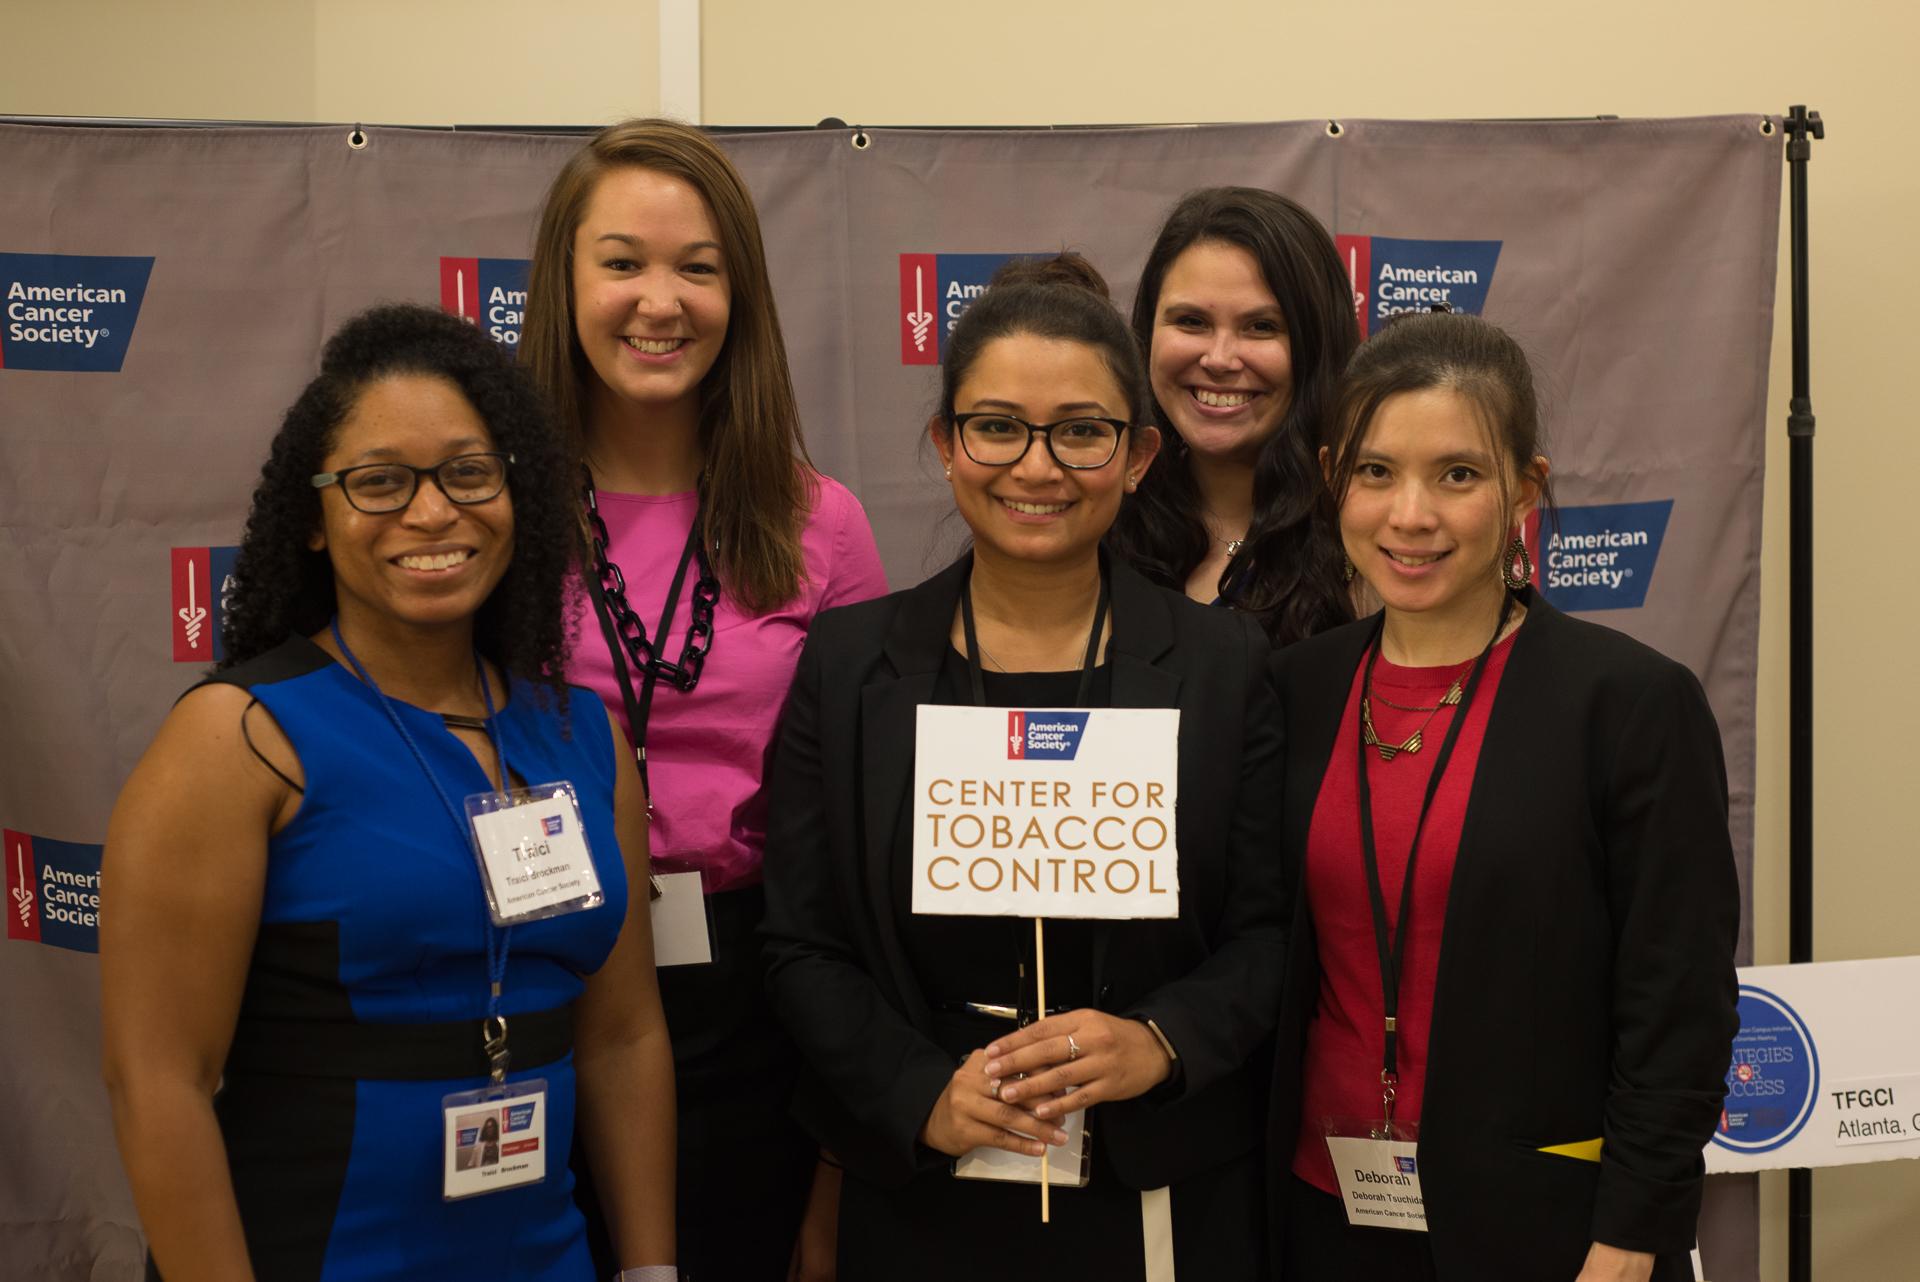 TFGCI Annual Grantee Meeting - Atlanta - Staff